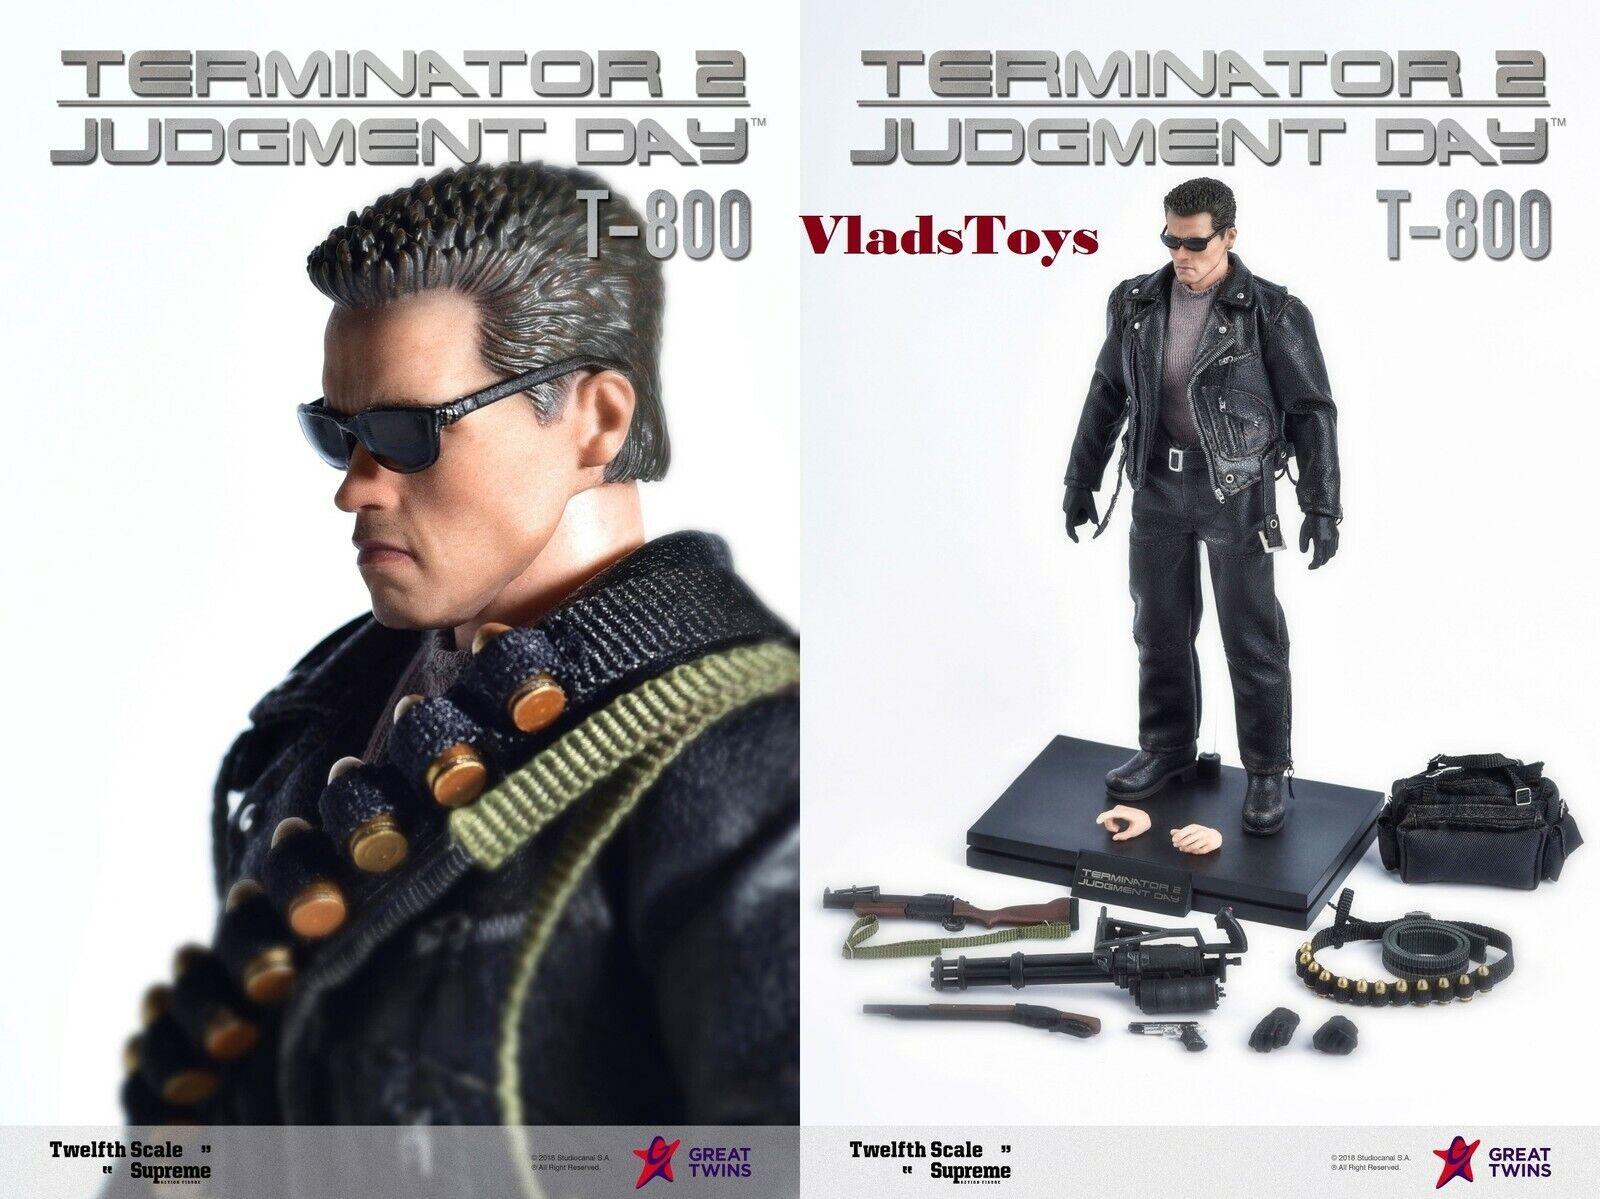 Terminator 2 Judgement Day T-800 Figura Arnold negroenegger 1 12 Gran Twins